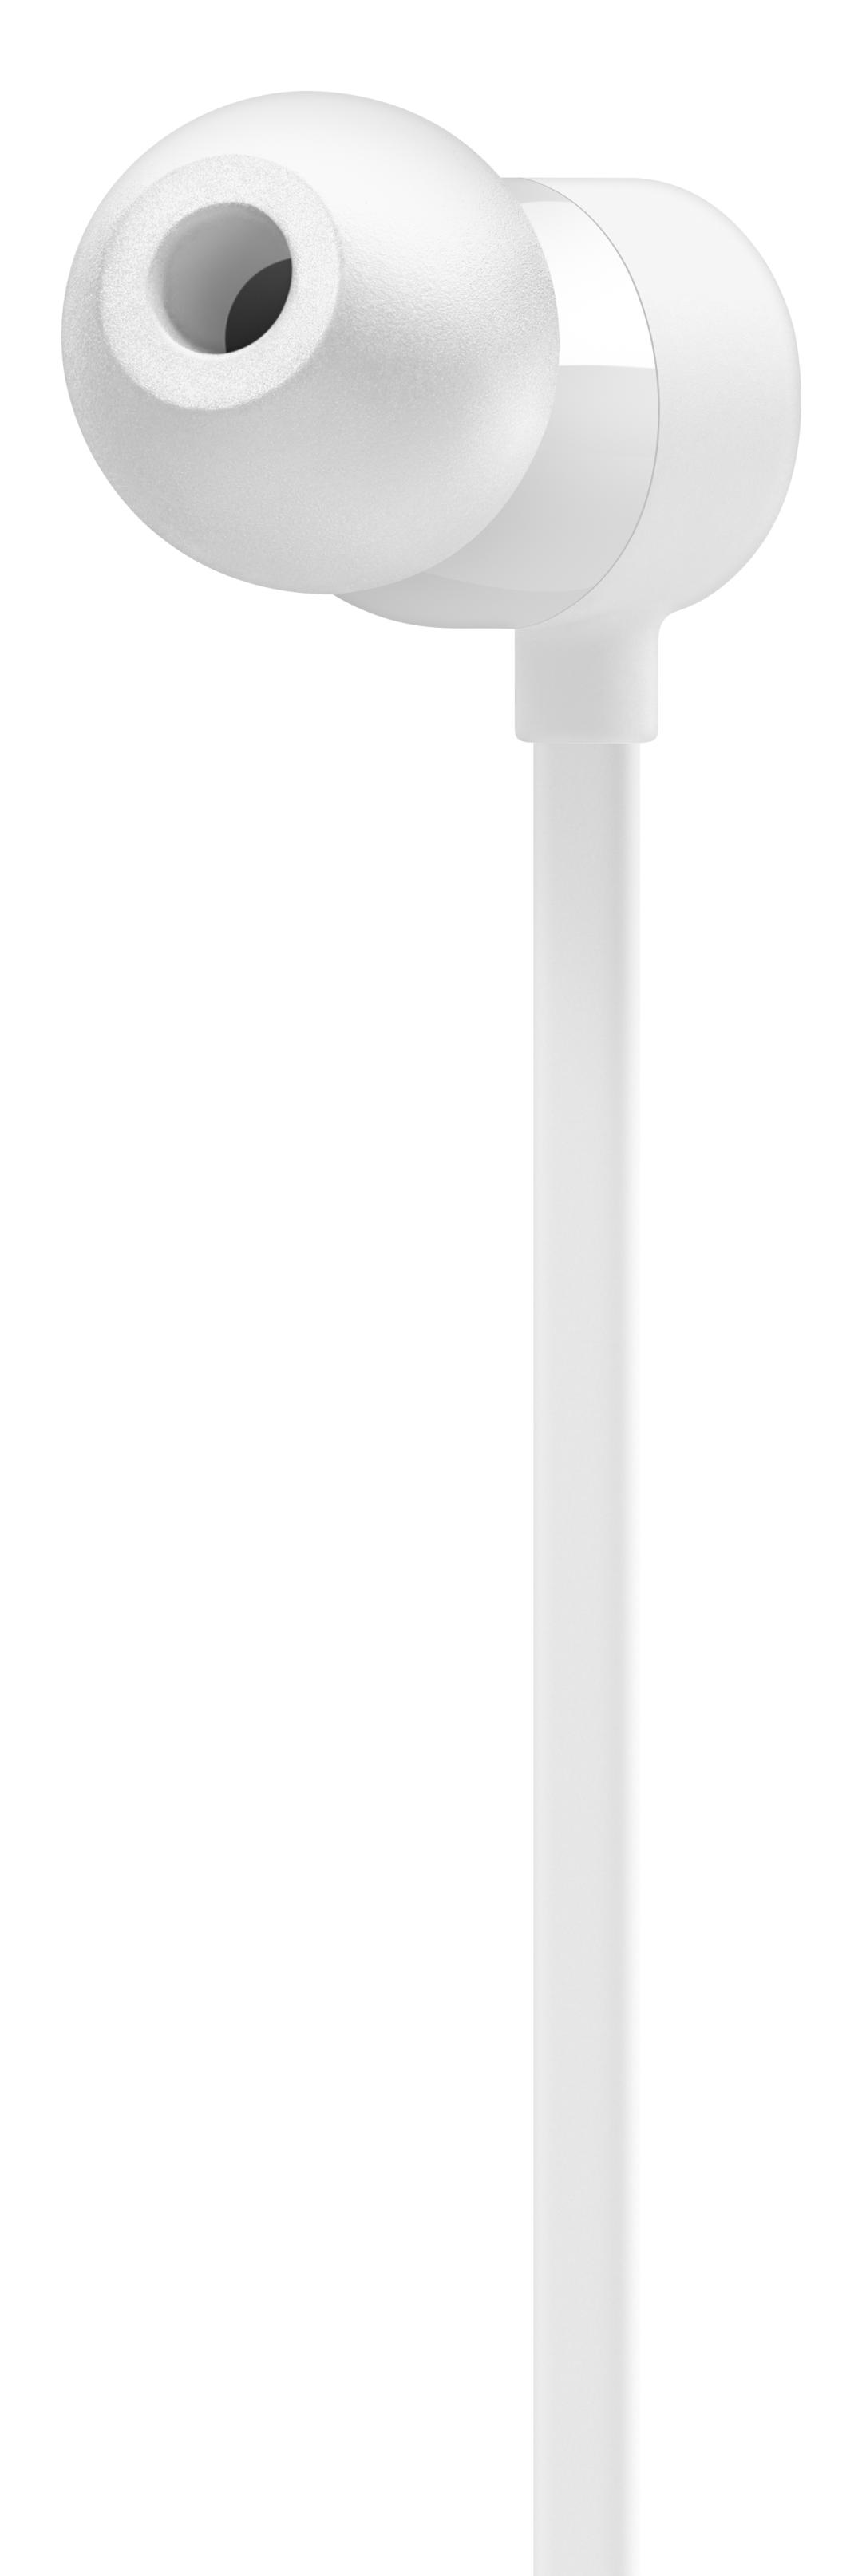 White_MLYF2-RGB-thrqtrrev-detail